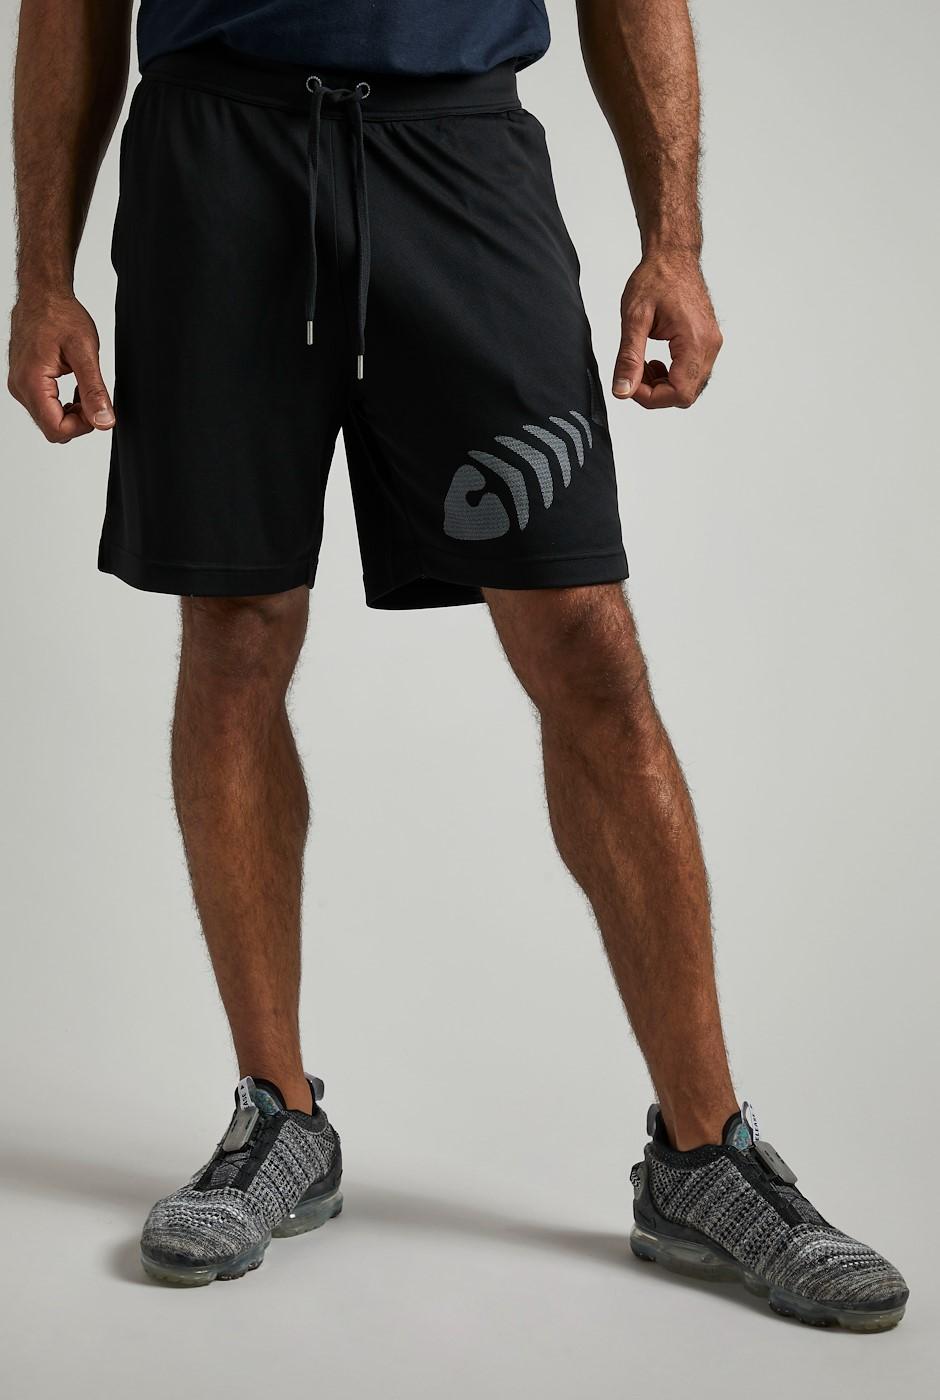 Arne Gym Shorts Black